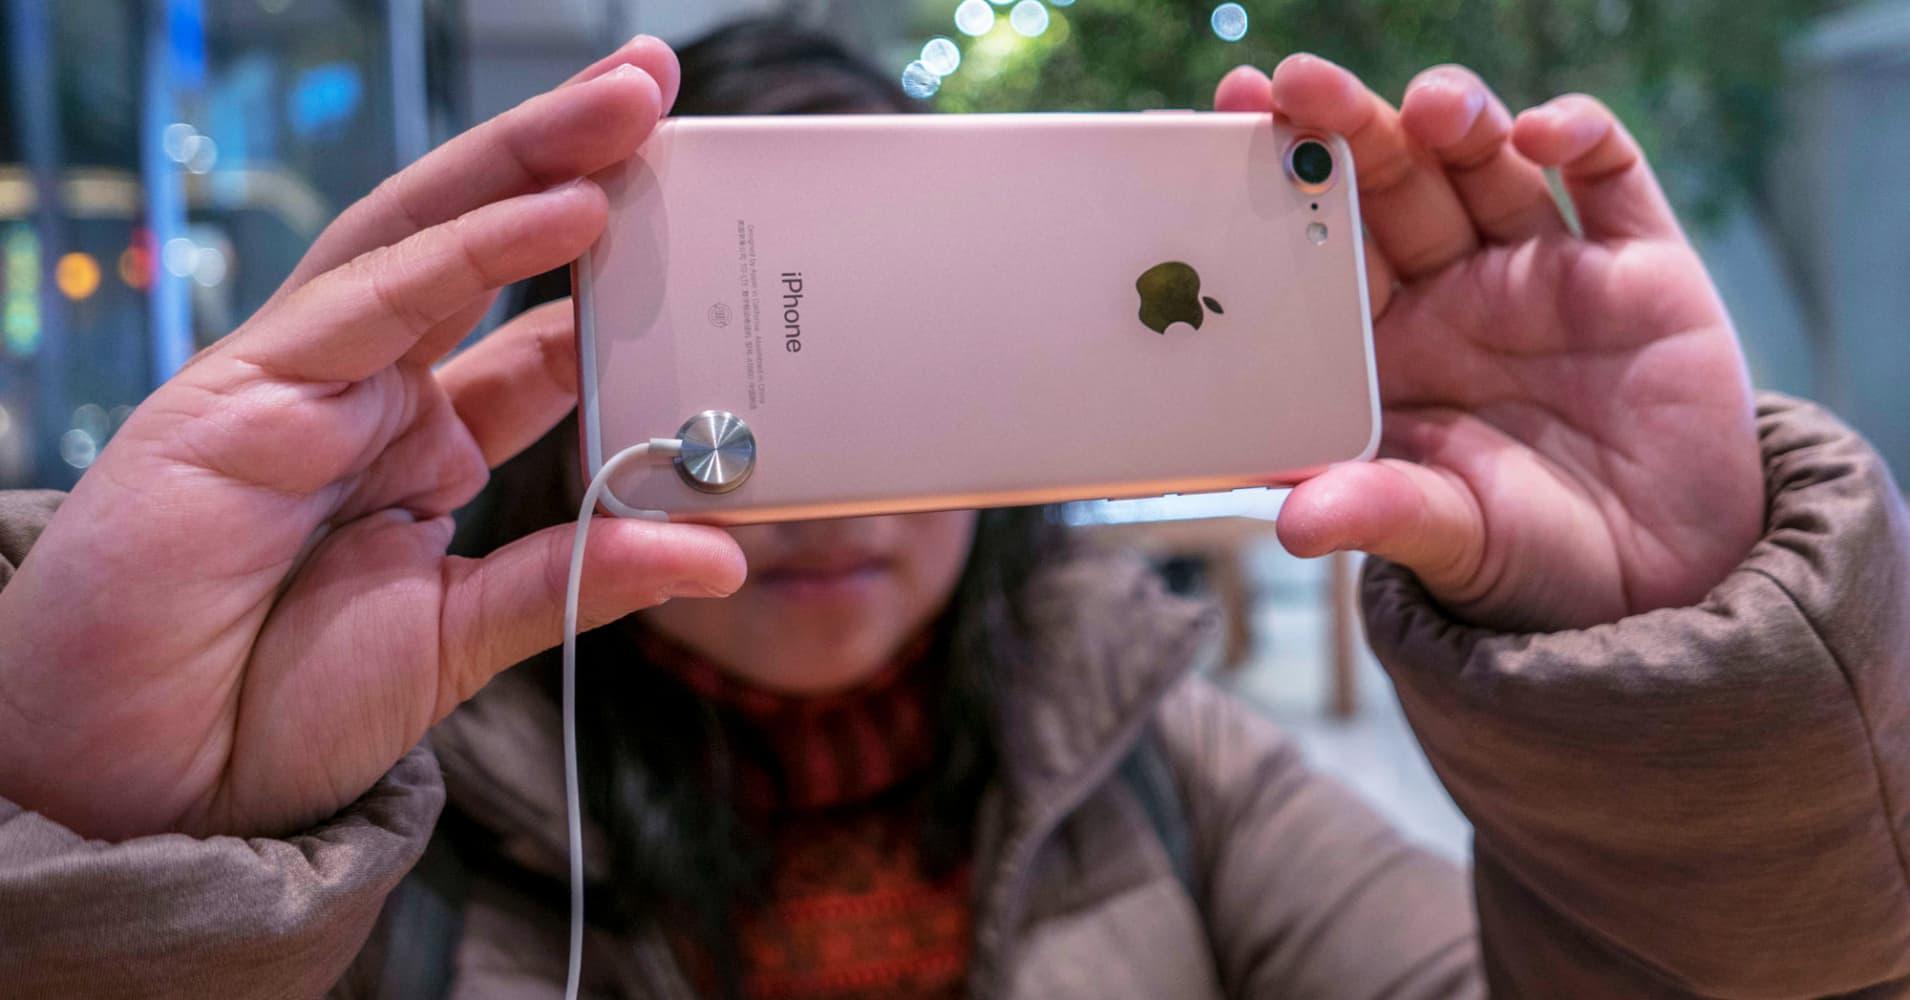 Apple expert Gene Munster: This is 'the golden opportunity' to buy Apple